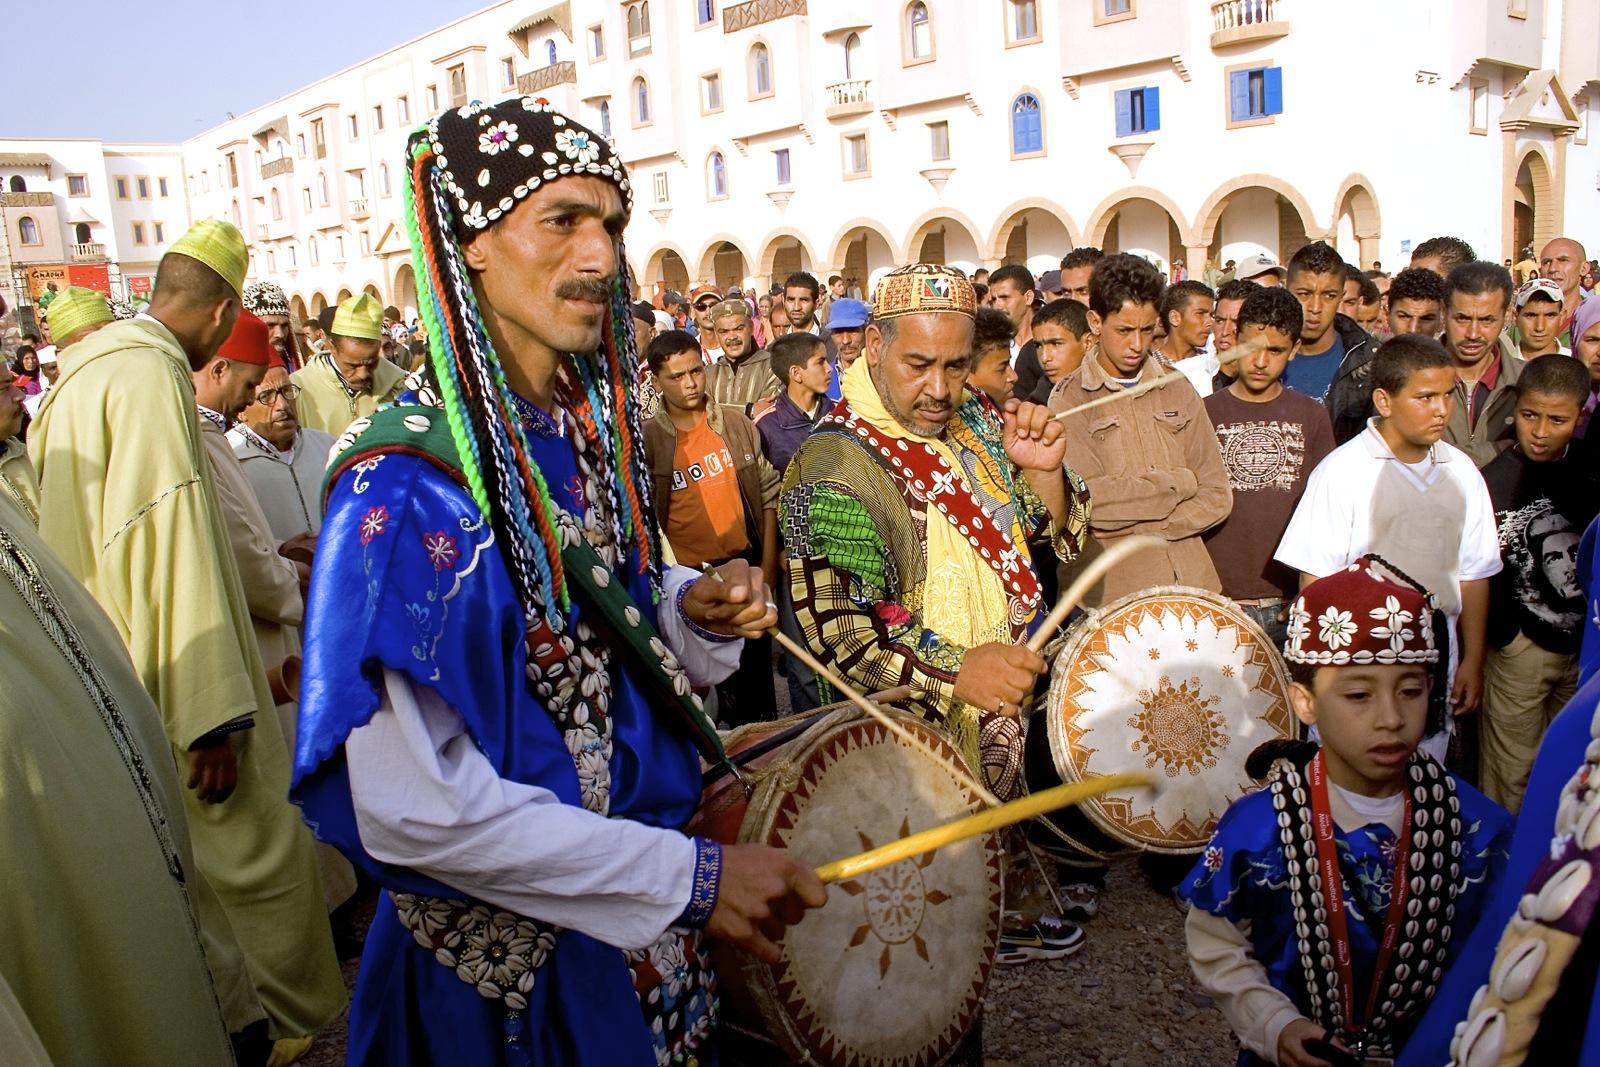 Gnaoua Music Festival Vince Millett Cc Httpflic.Krp54 Ba Yv   12